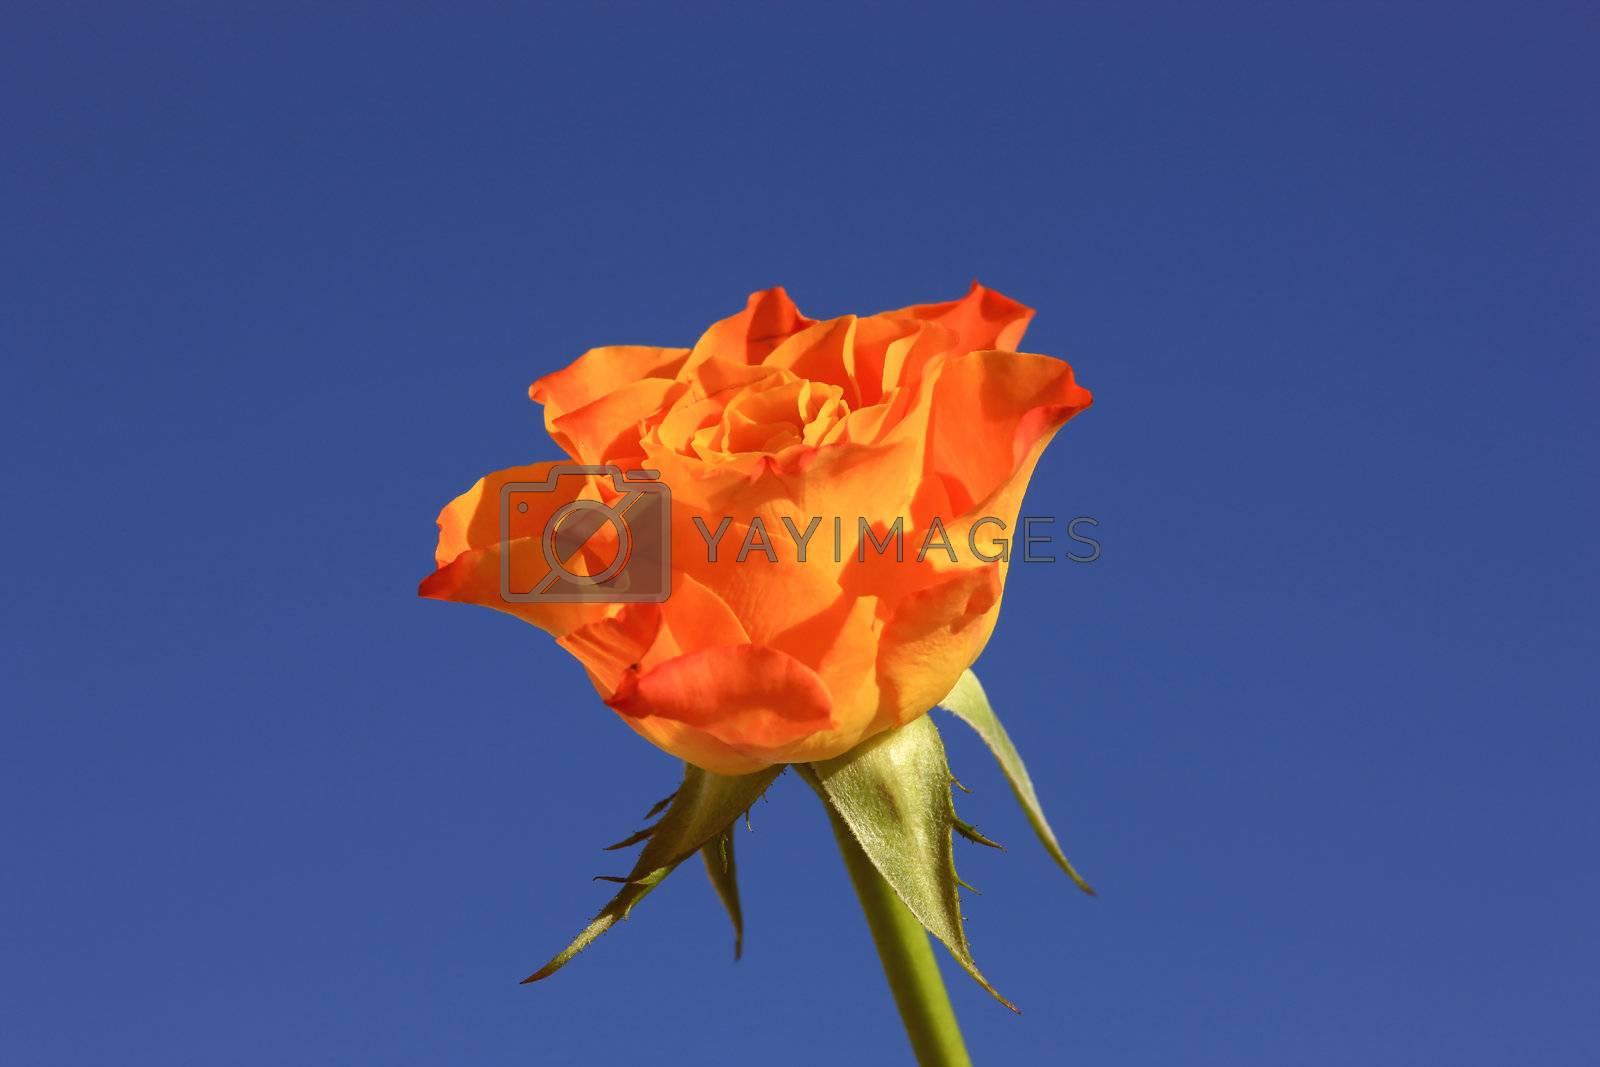 Royalty free image of Orange Rose by monner